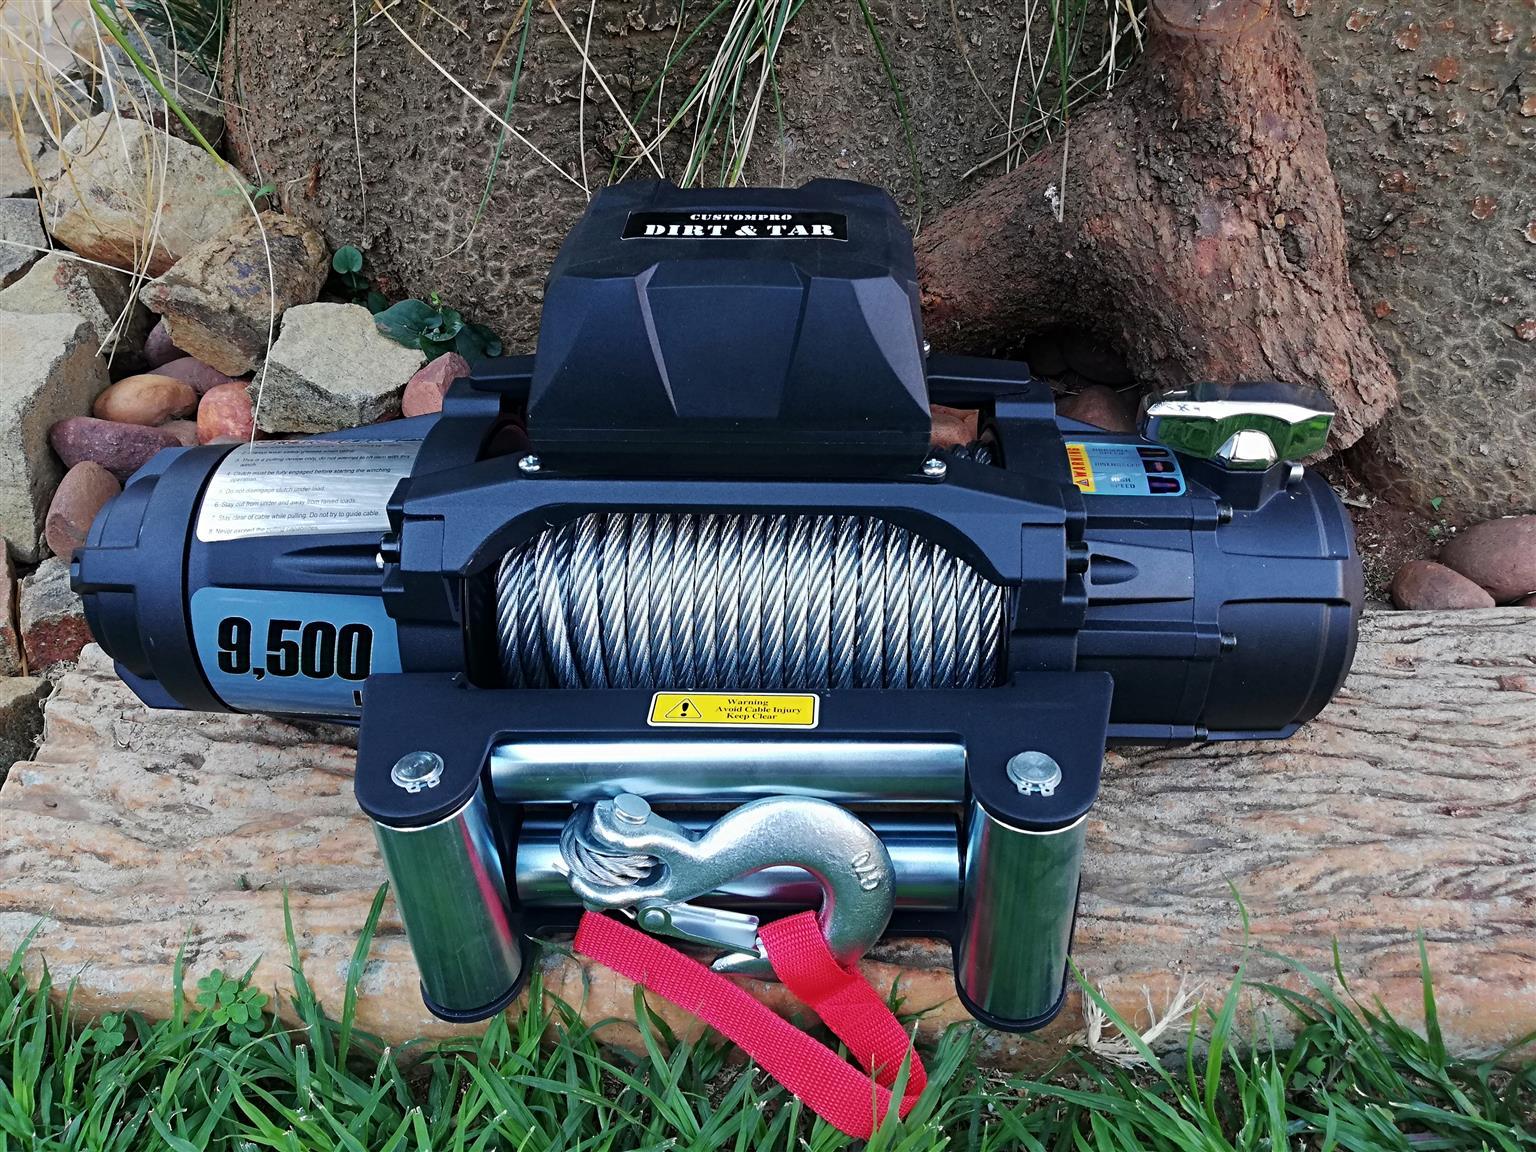 Winch 9500lb